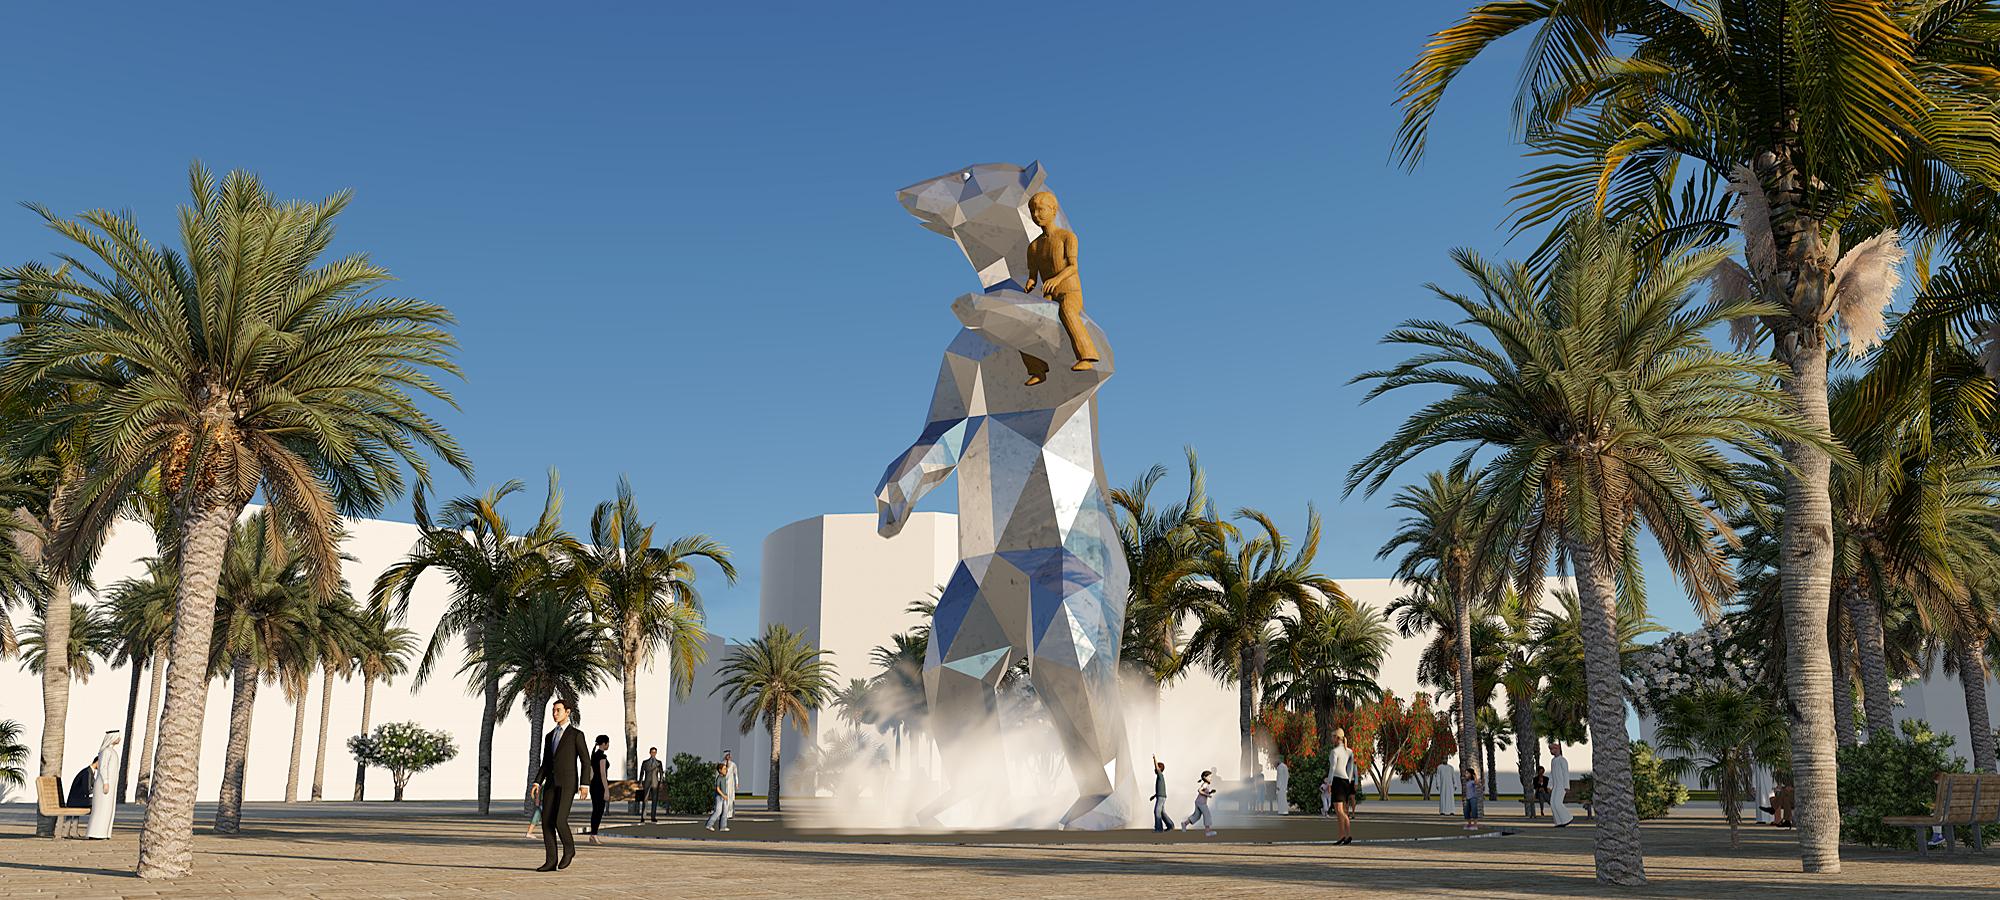 PUBLIC ART, Abu Dhabi, BlokLugthart